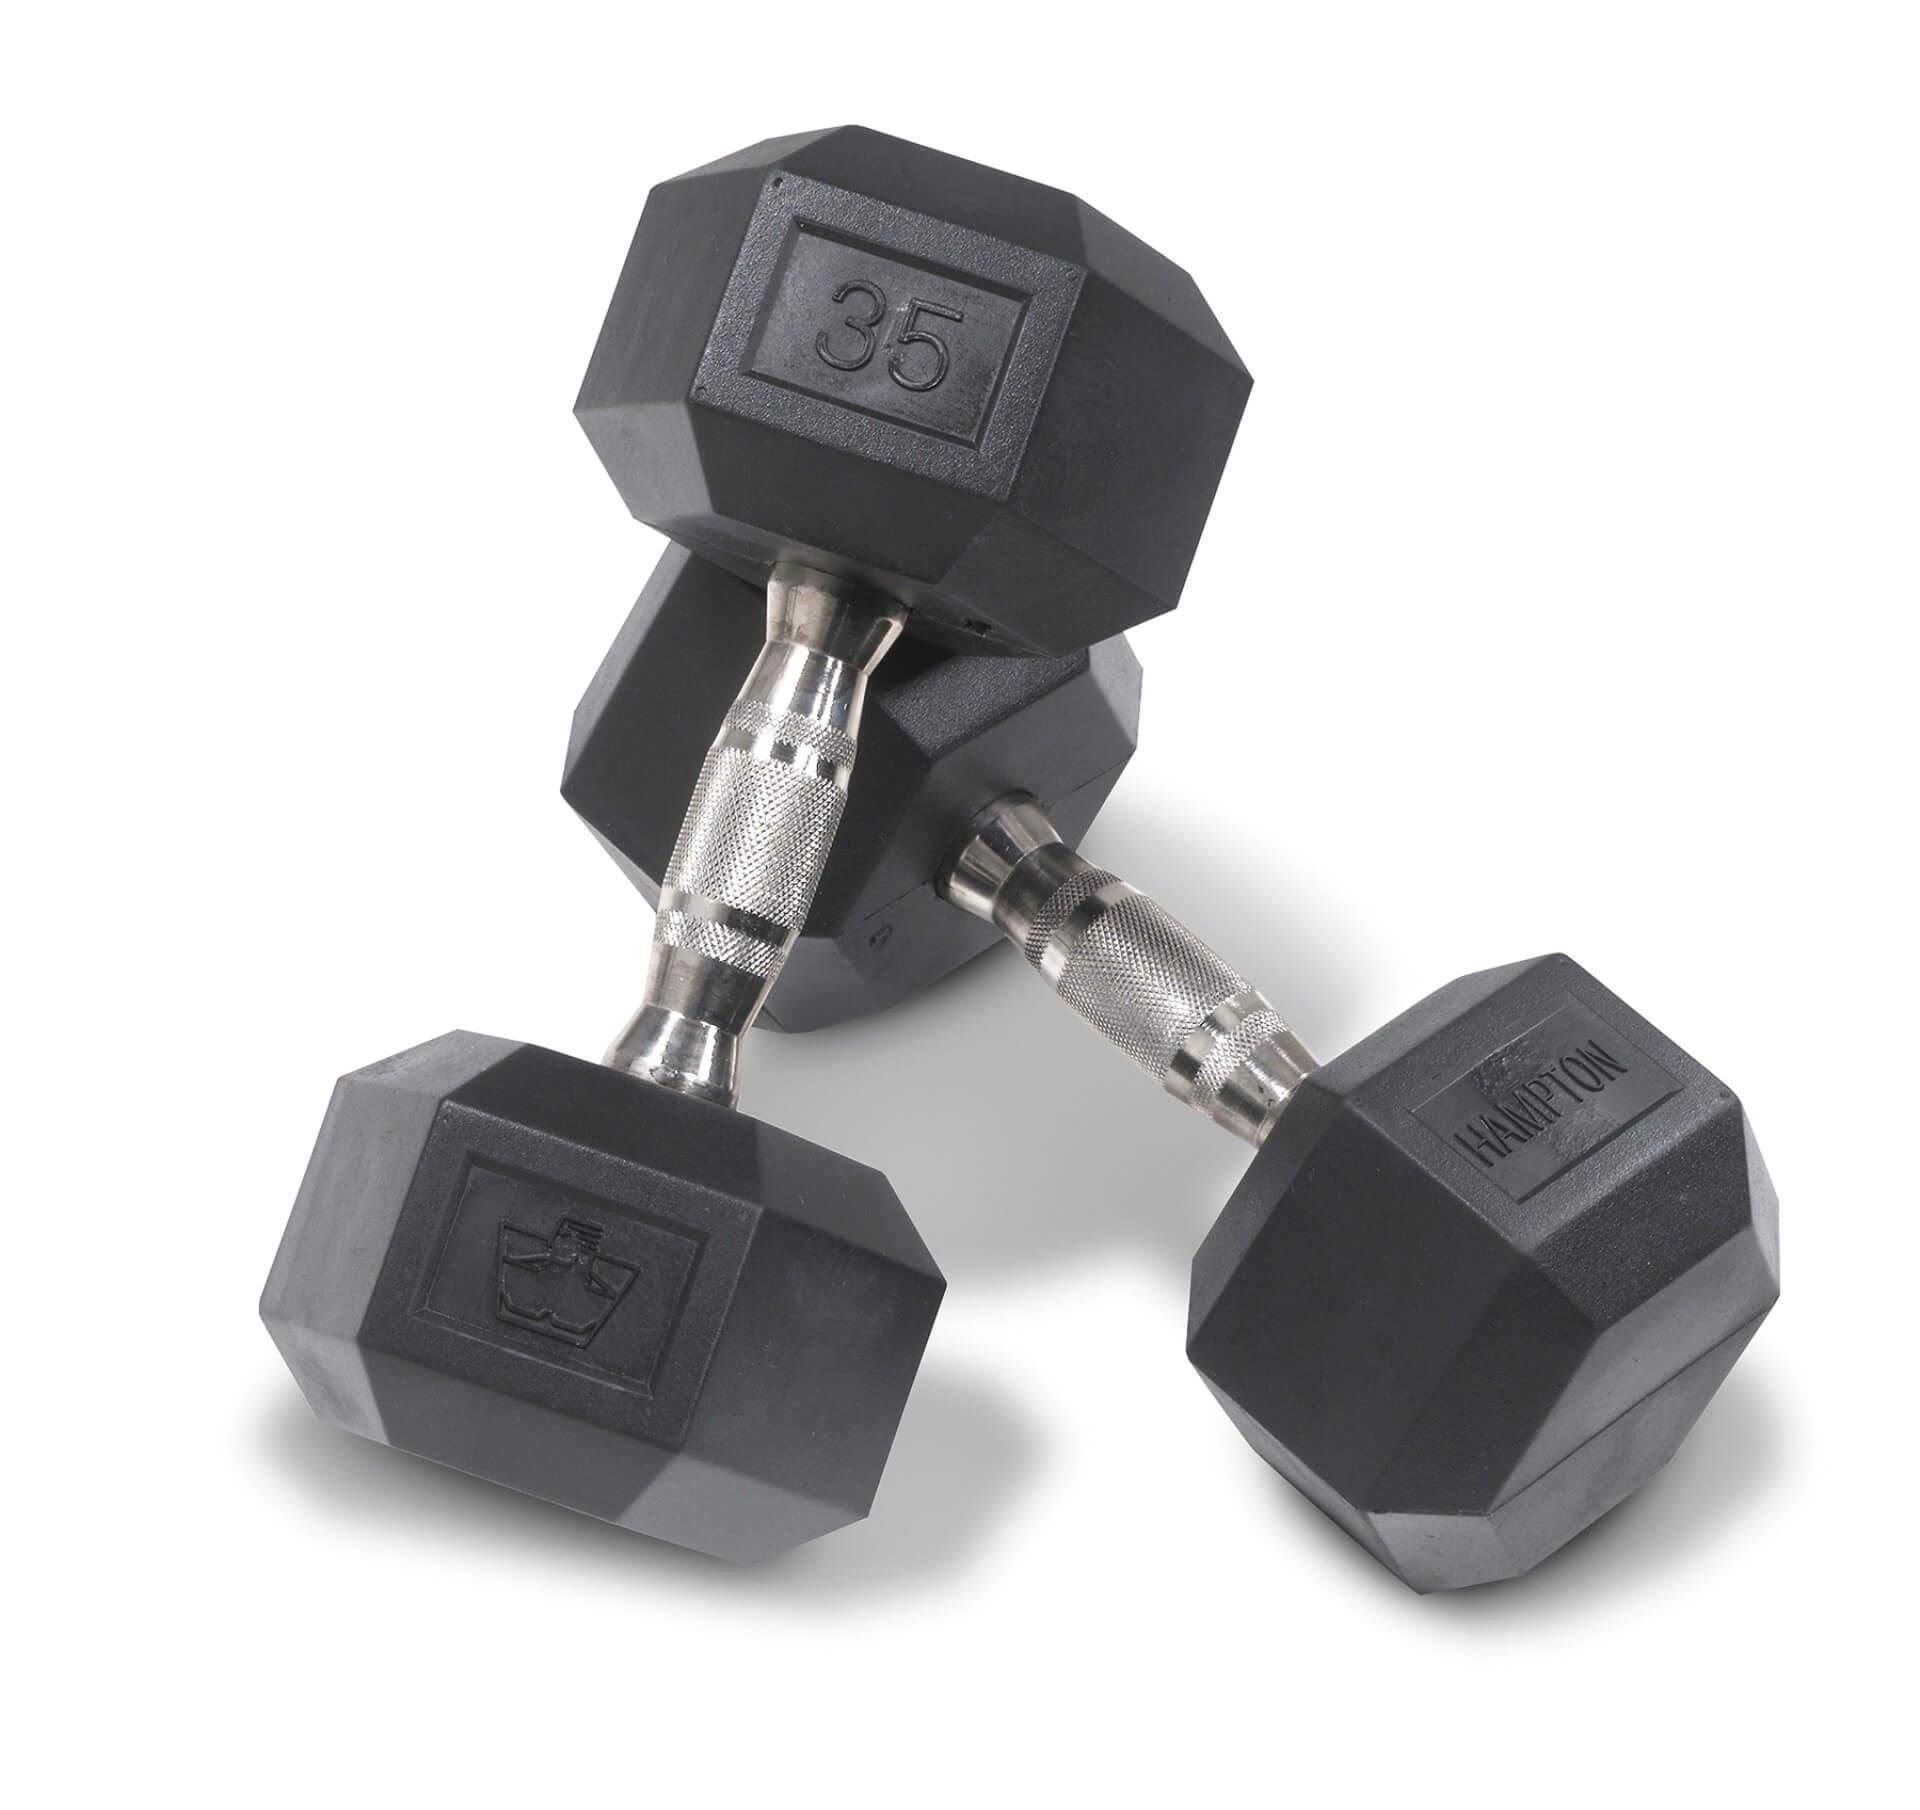 urethane dura bell dumbbells pairs hampton fitnessurethane dura bell dumbbells \u2013 pairs